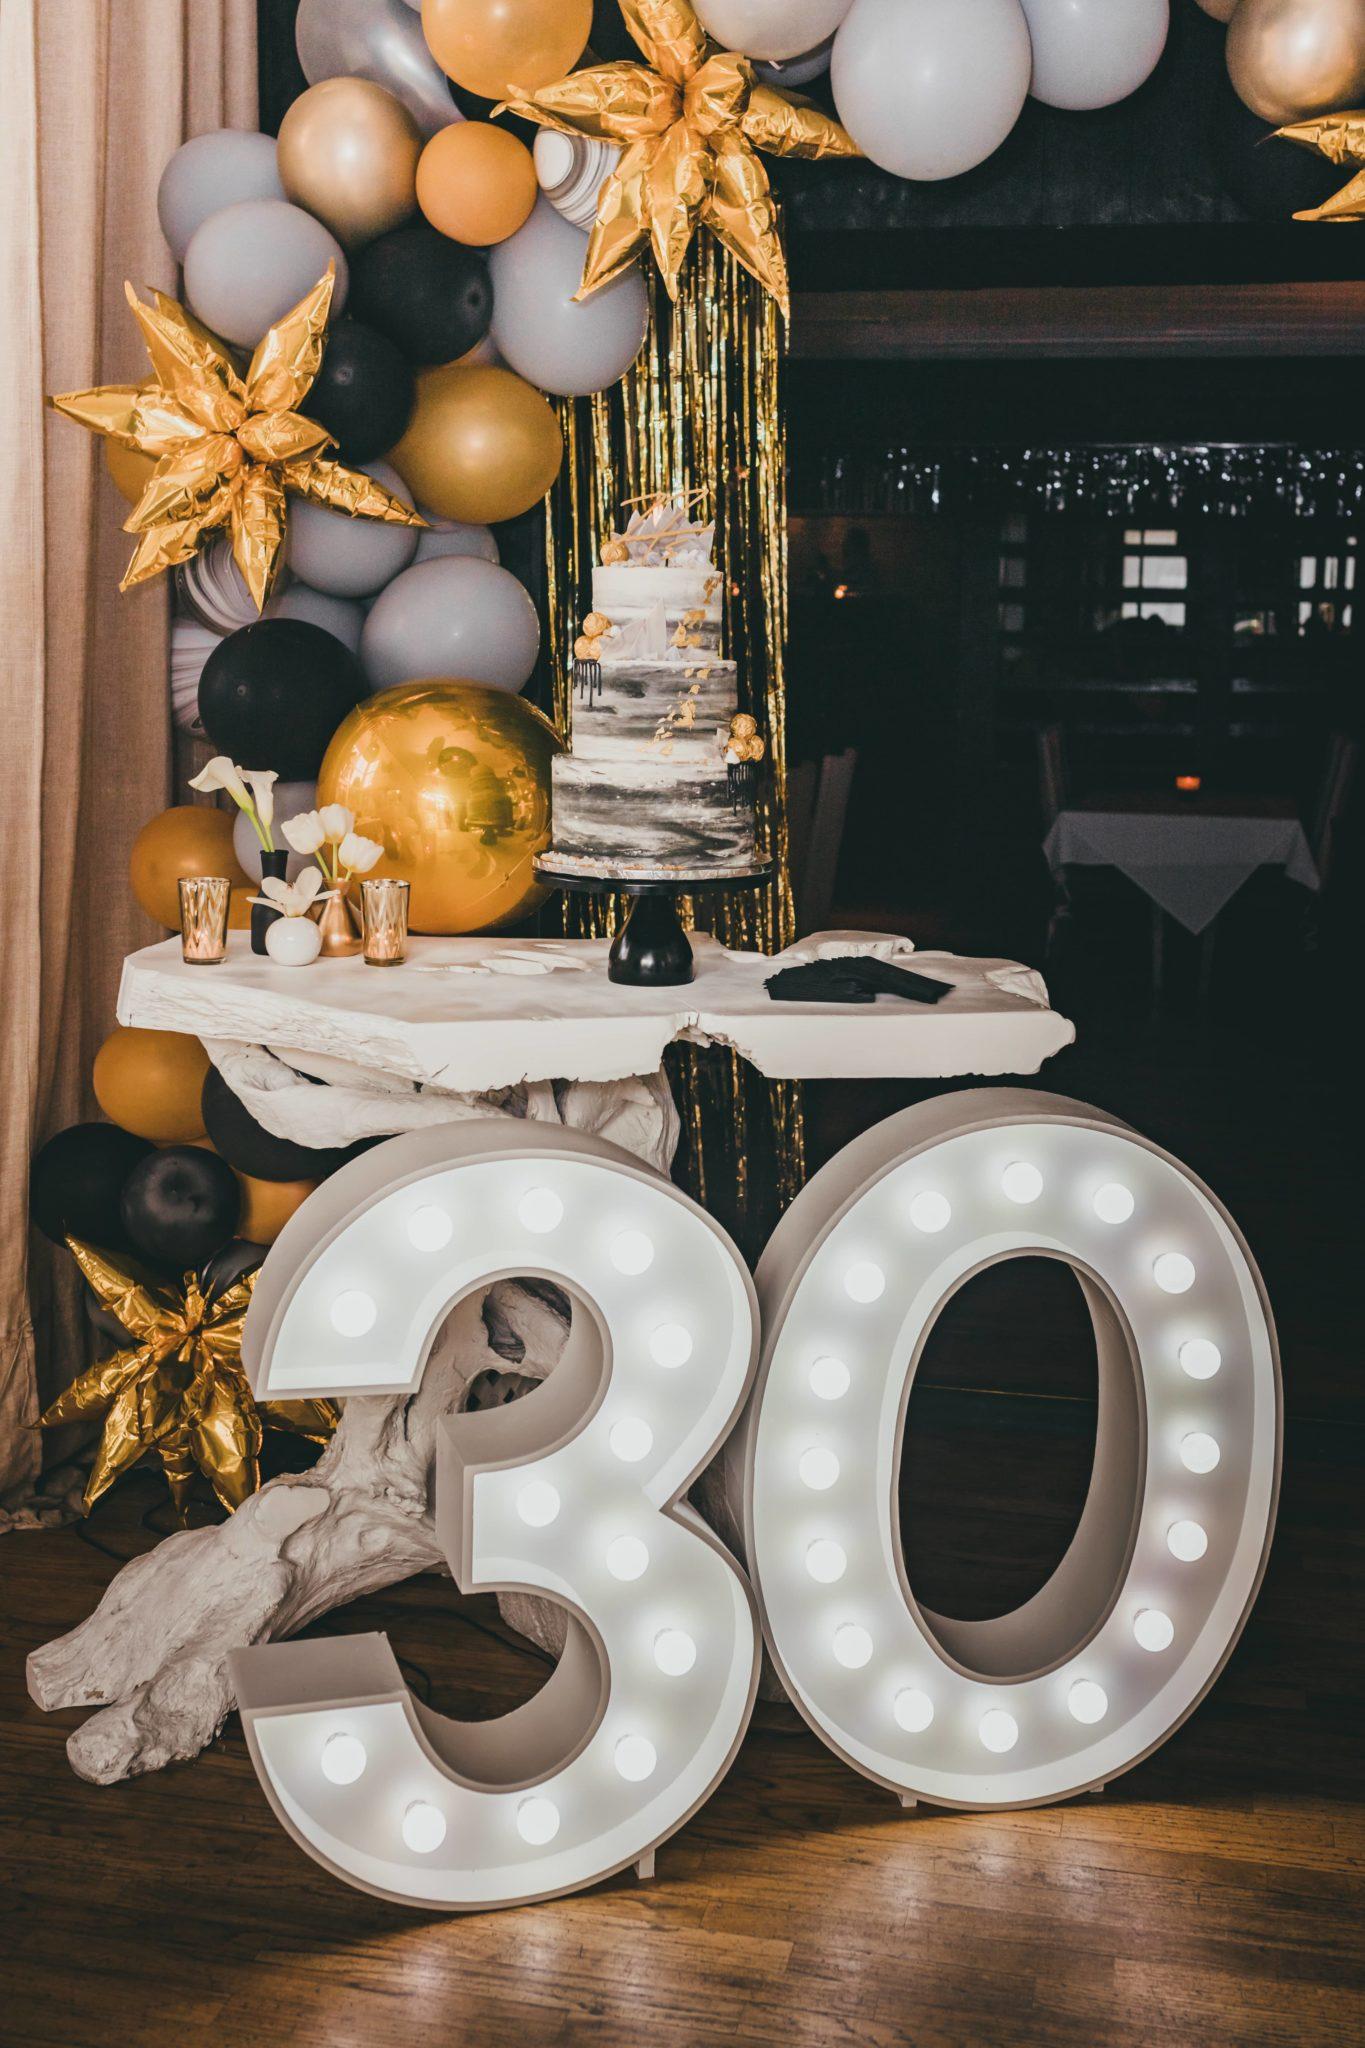 Freddies-30th-Birthday-Party-10-Degrees-South-5371